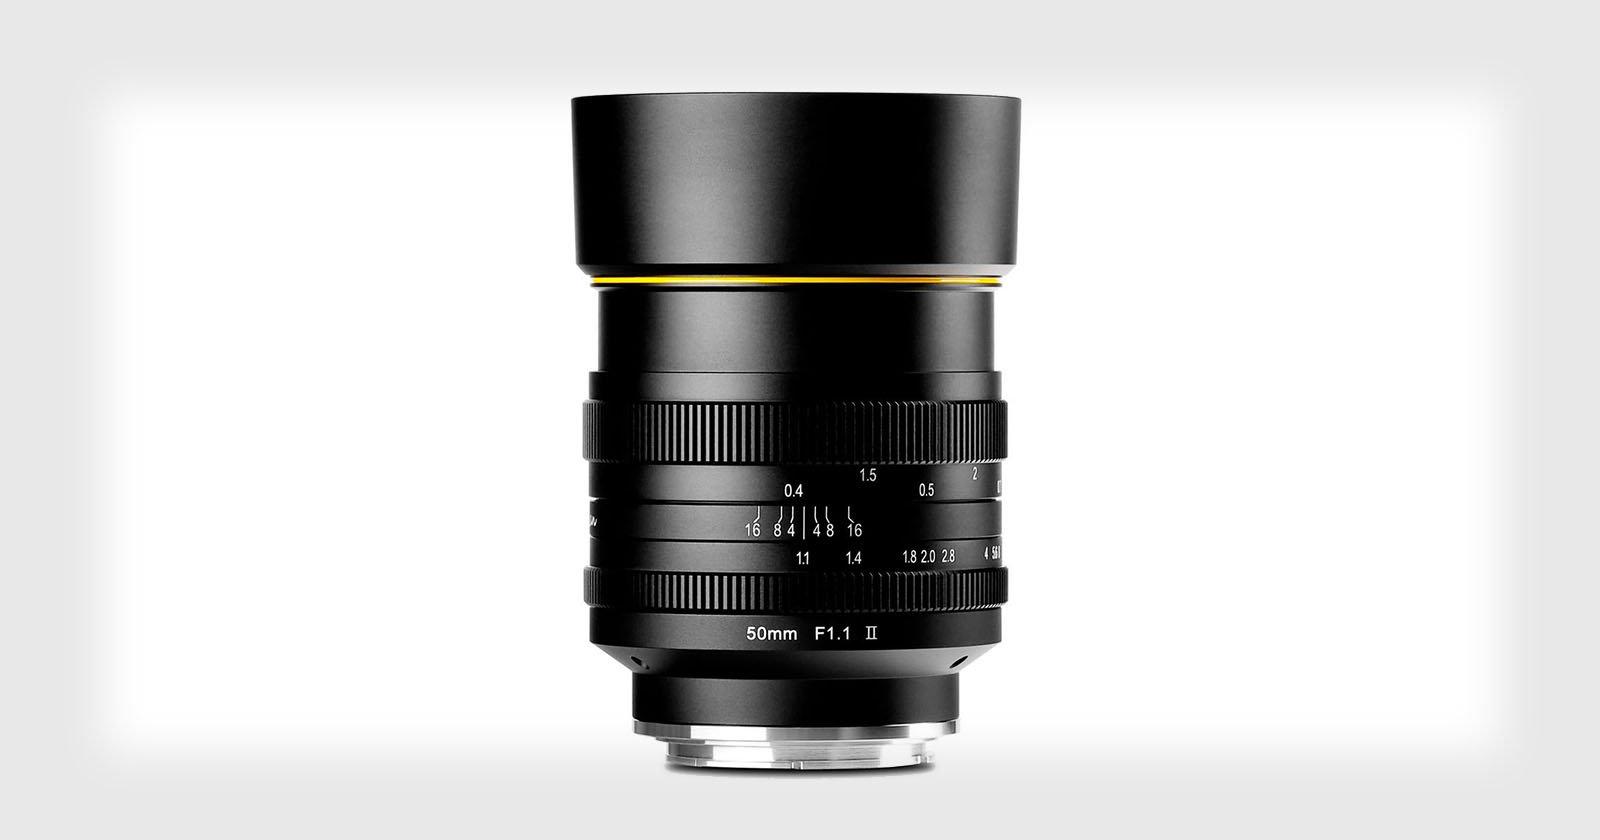 Kamlan 50mm f/1 1 II is a $250 'Bokeh Beast' for APS-C